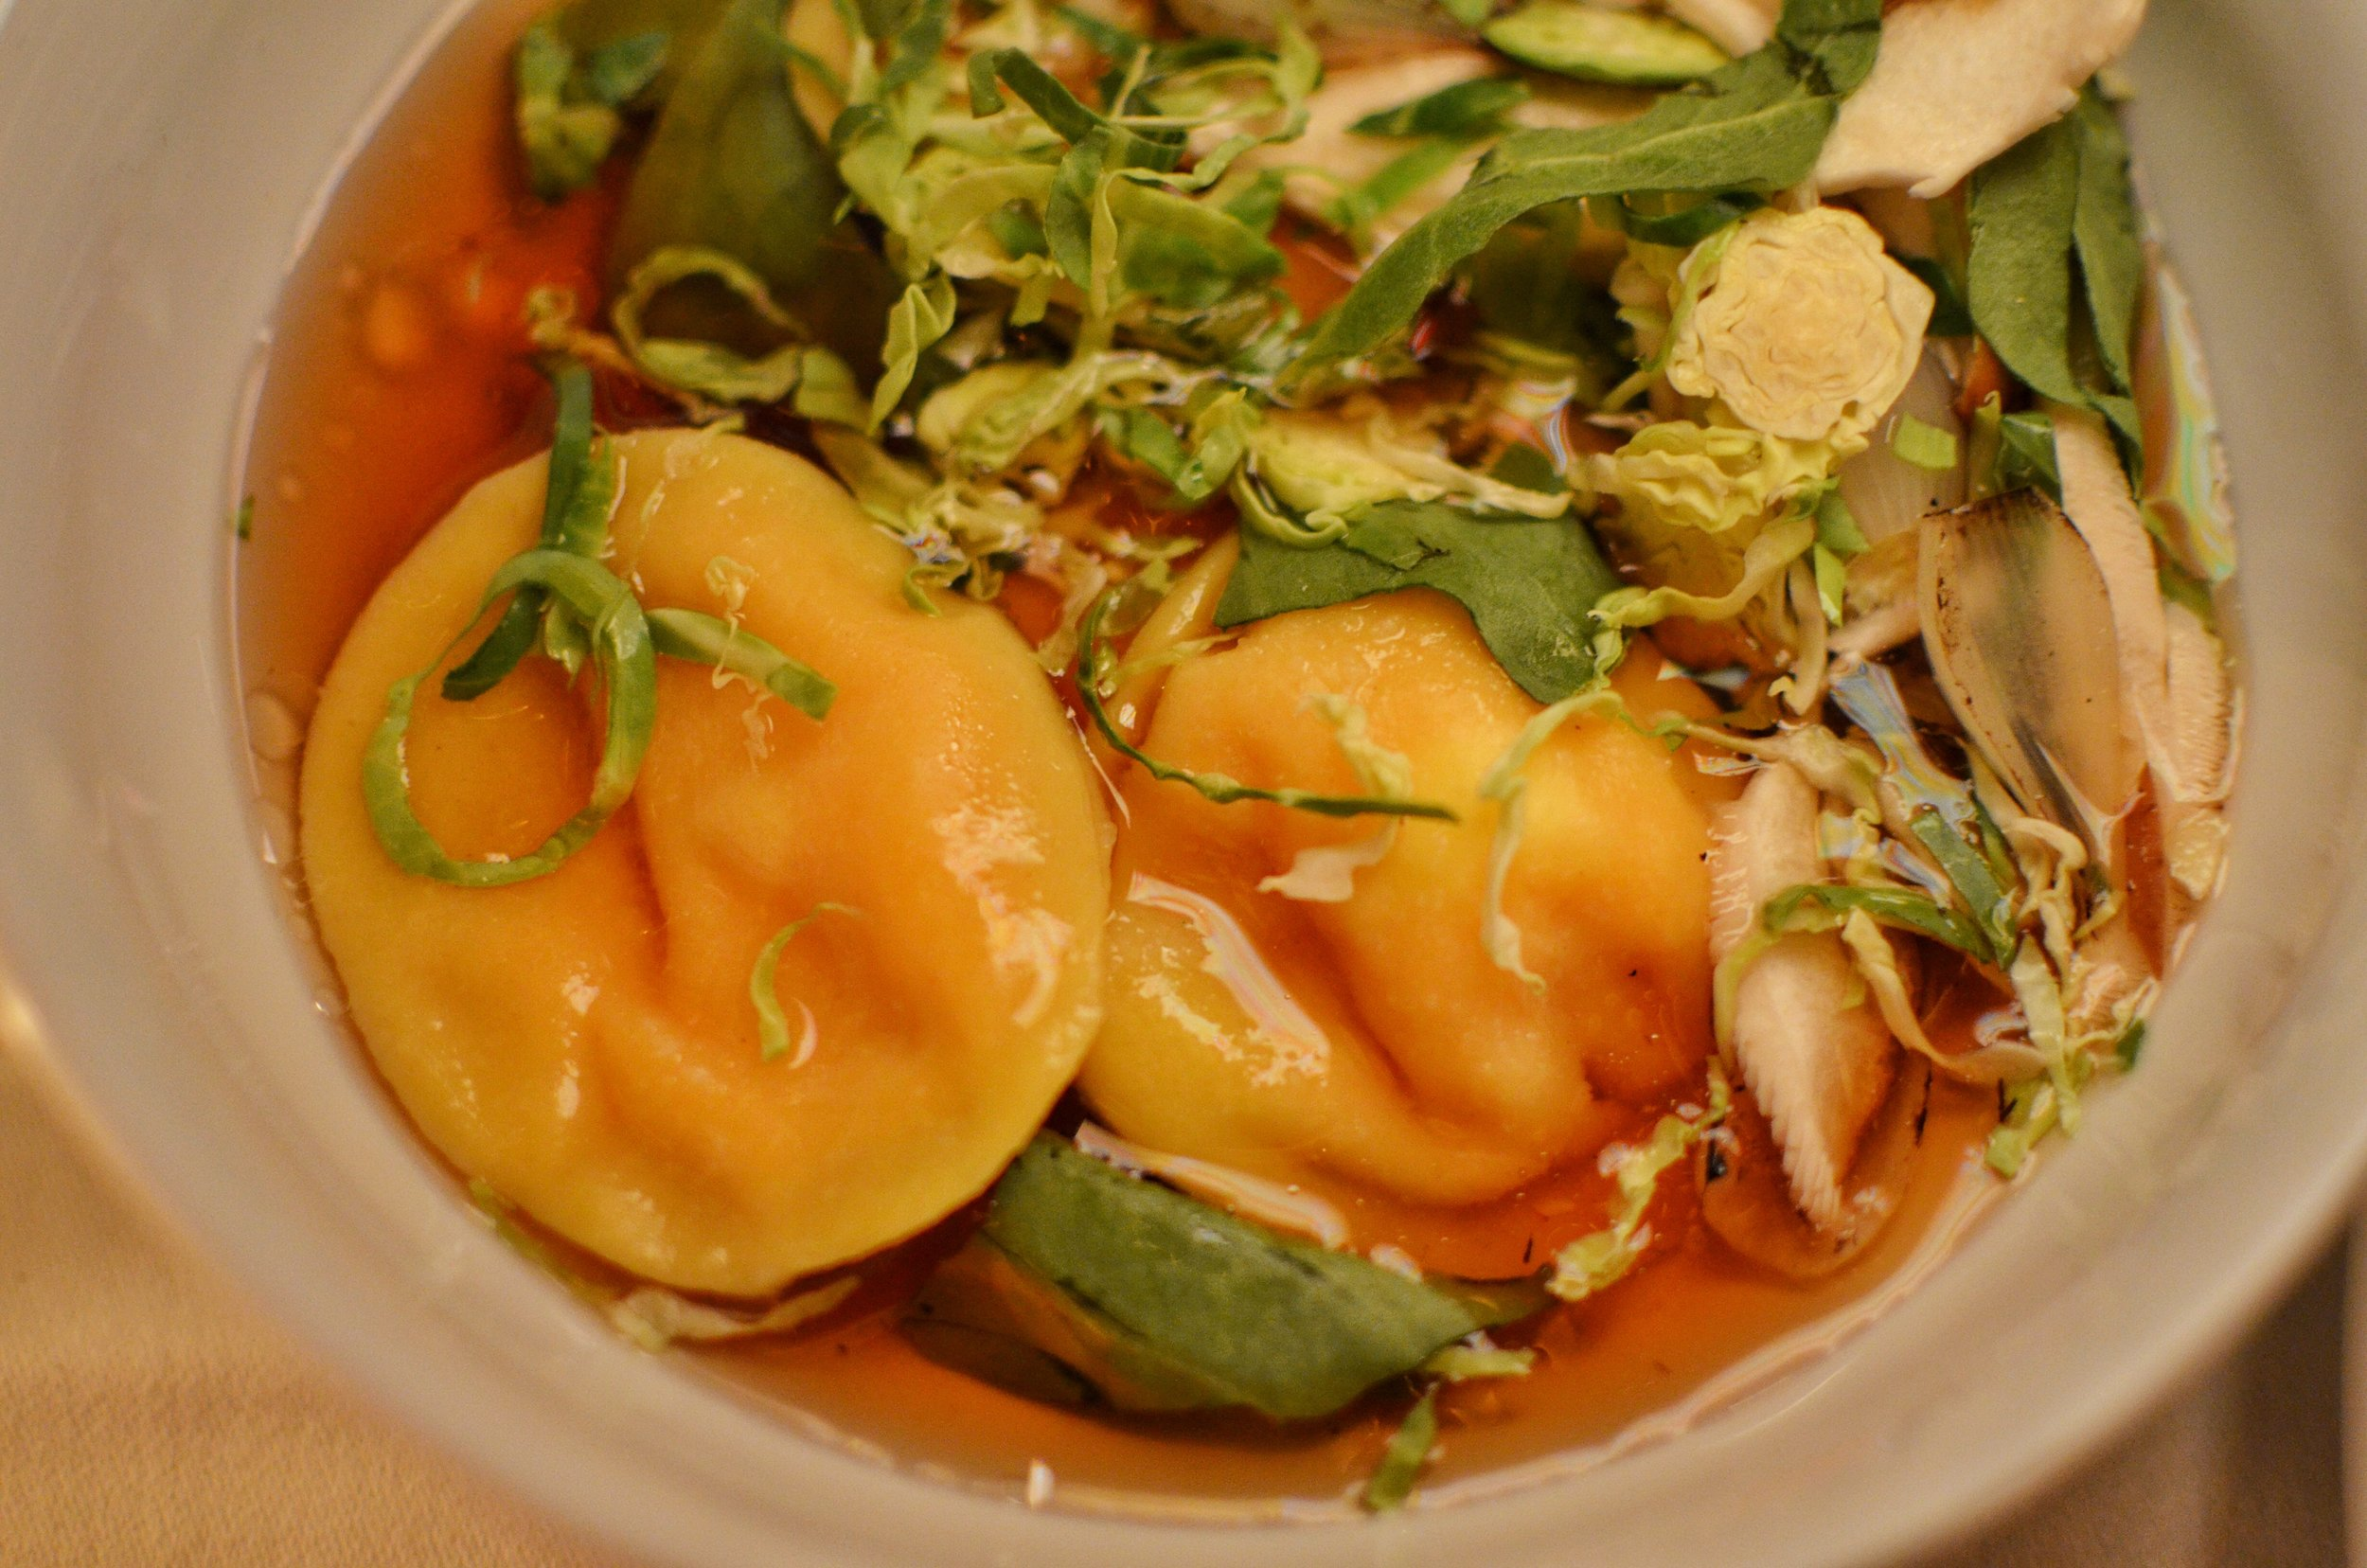 Pumpkin ravioli, shiitake consomme, fall spices